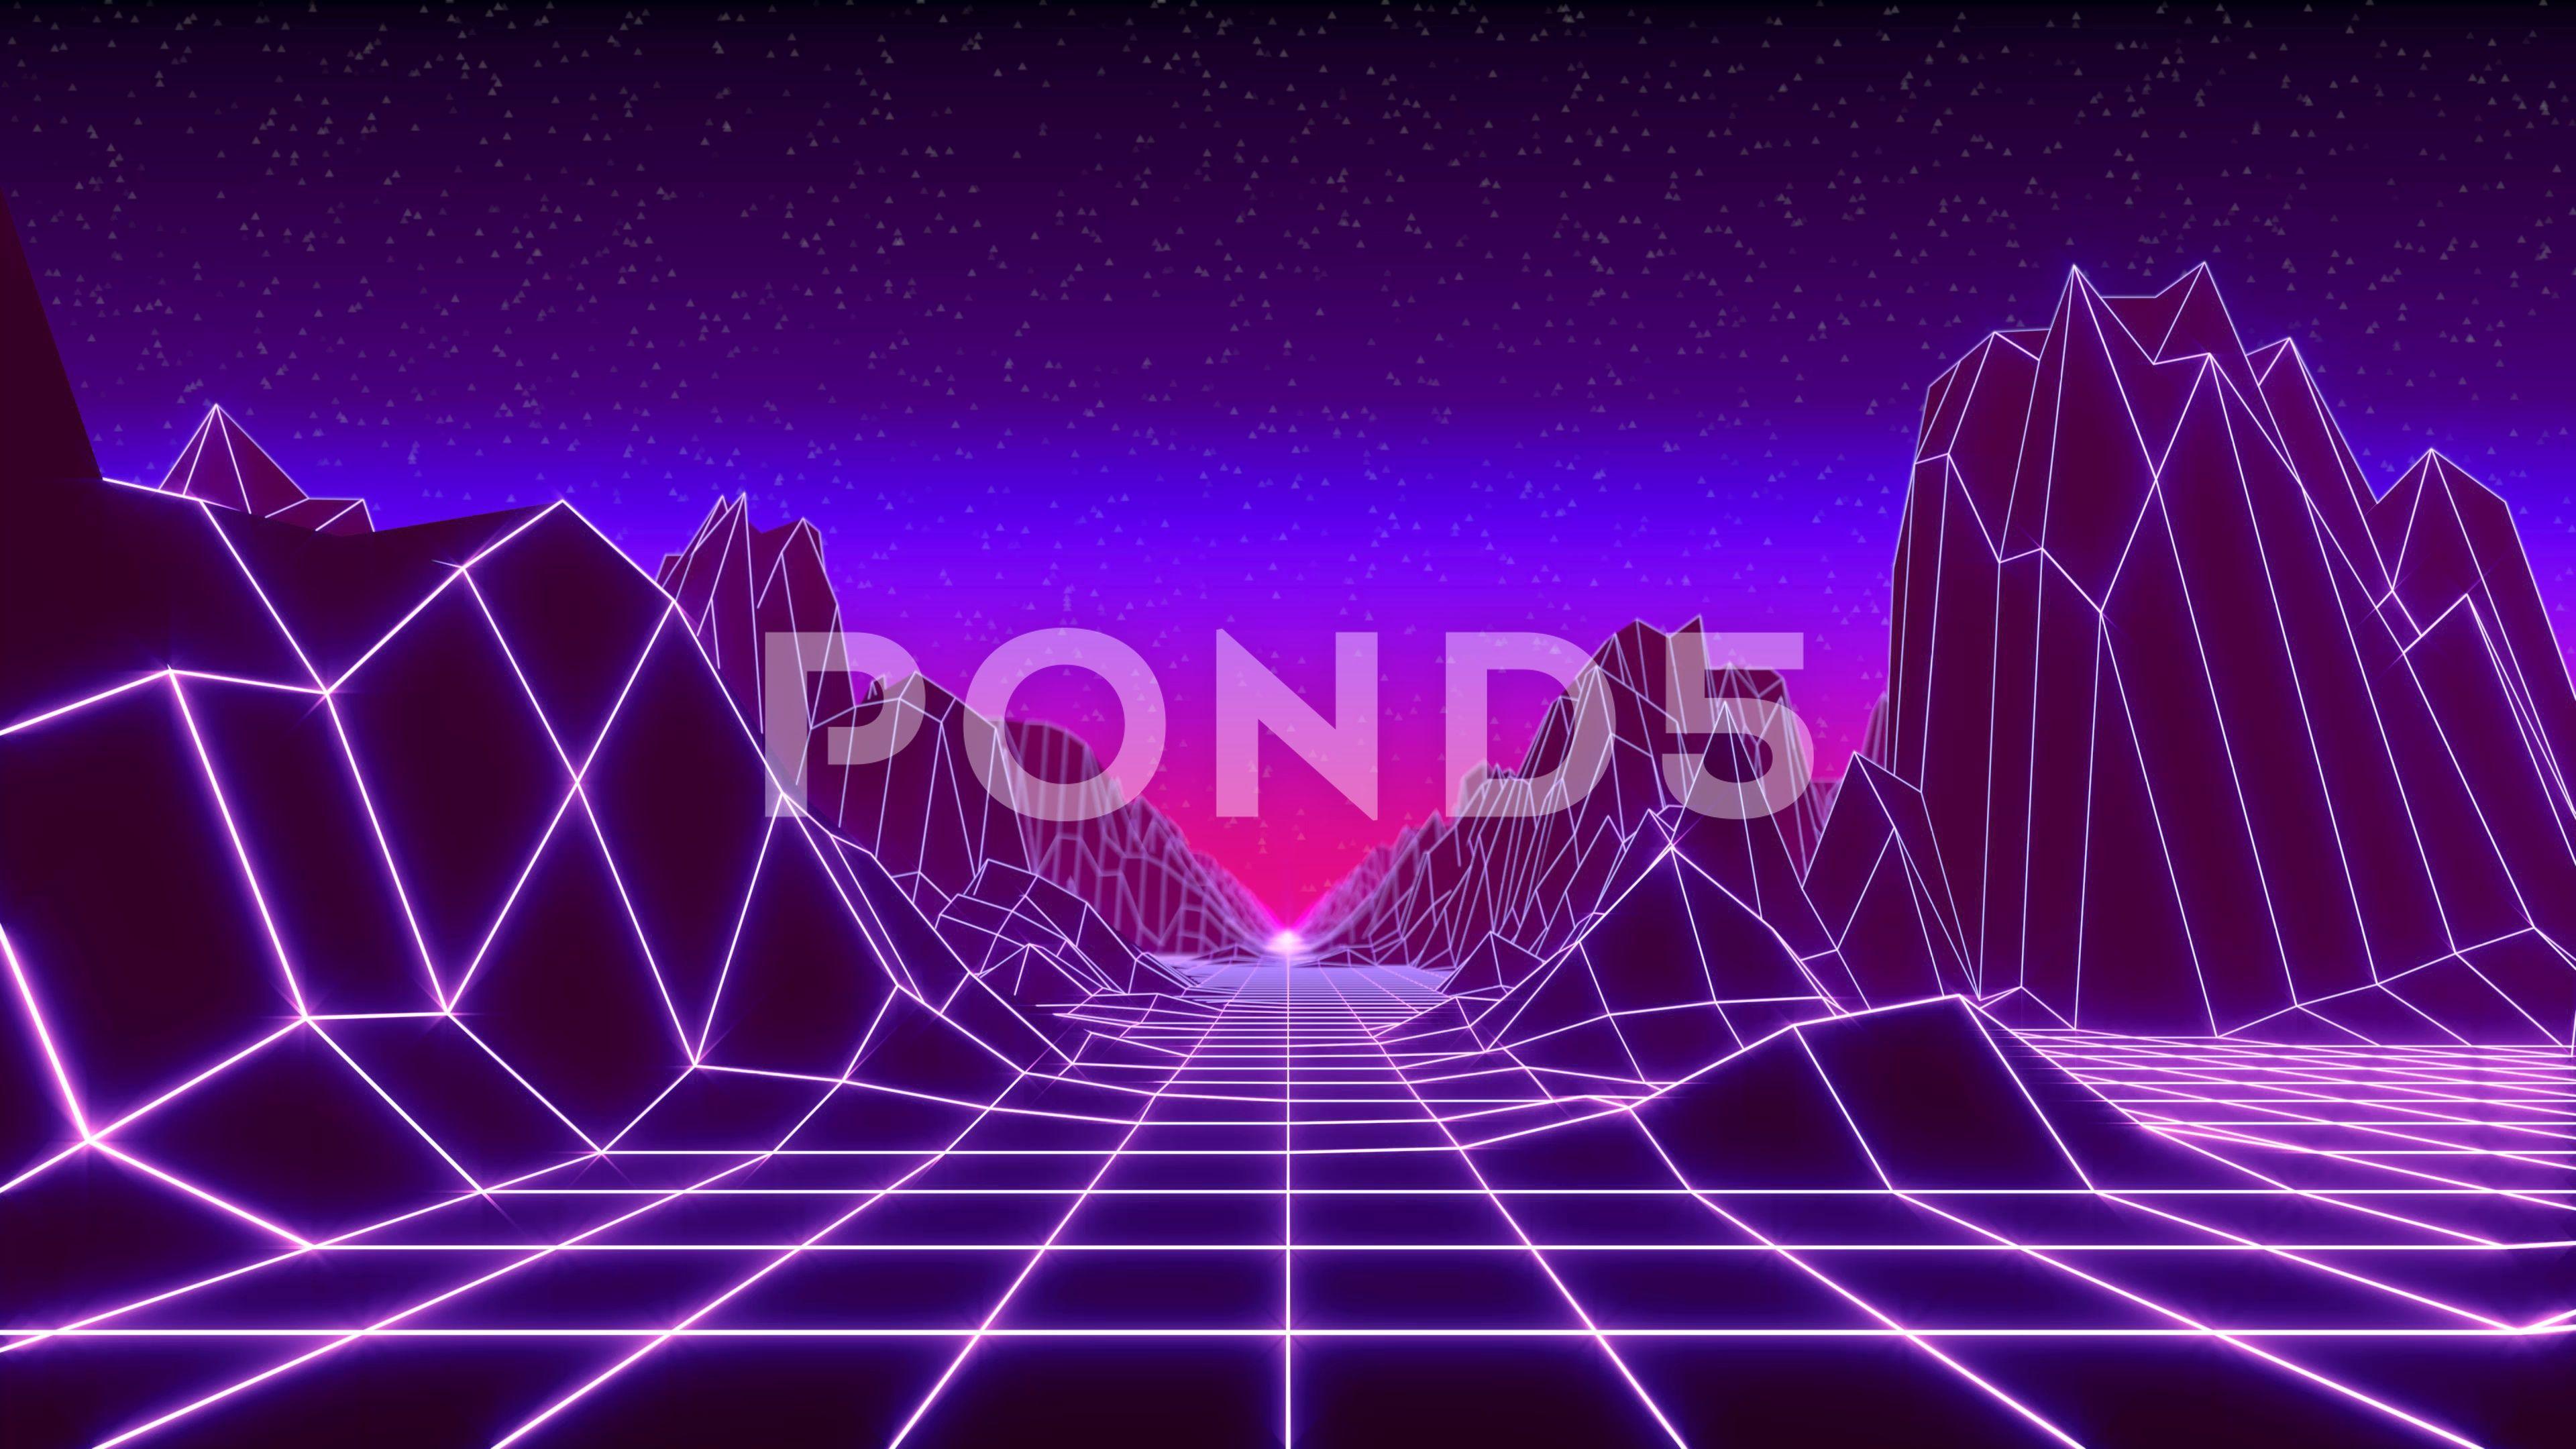 80s Retro Background Loop Animation Retrowave Horizon Landscape With Neon Light Stock Footage Ad Loop Animation Retrow Retro Background 80s Background Neon